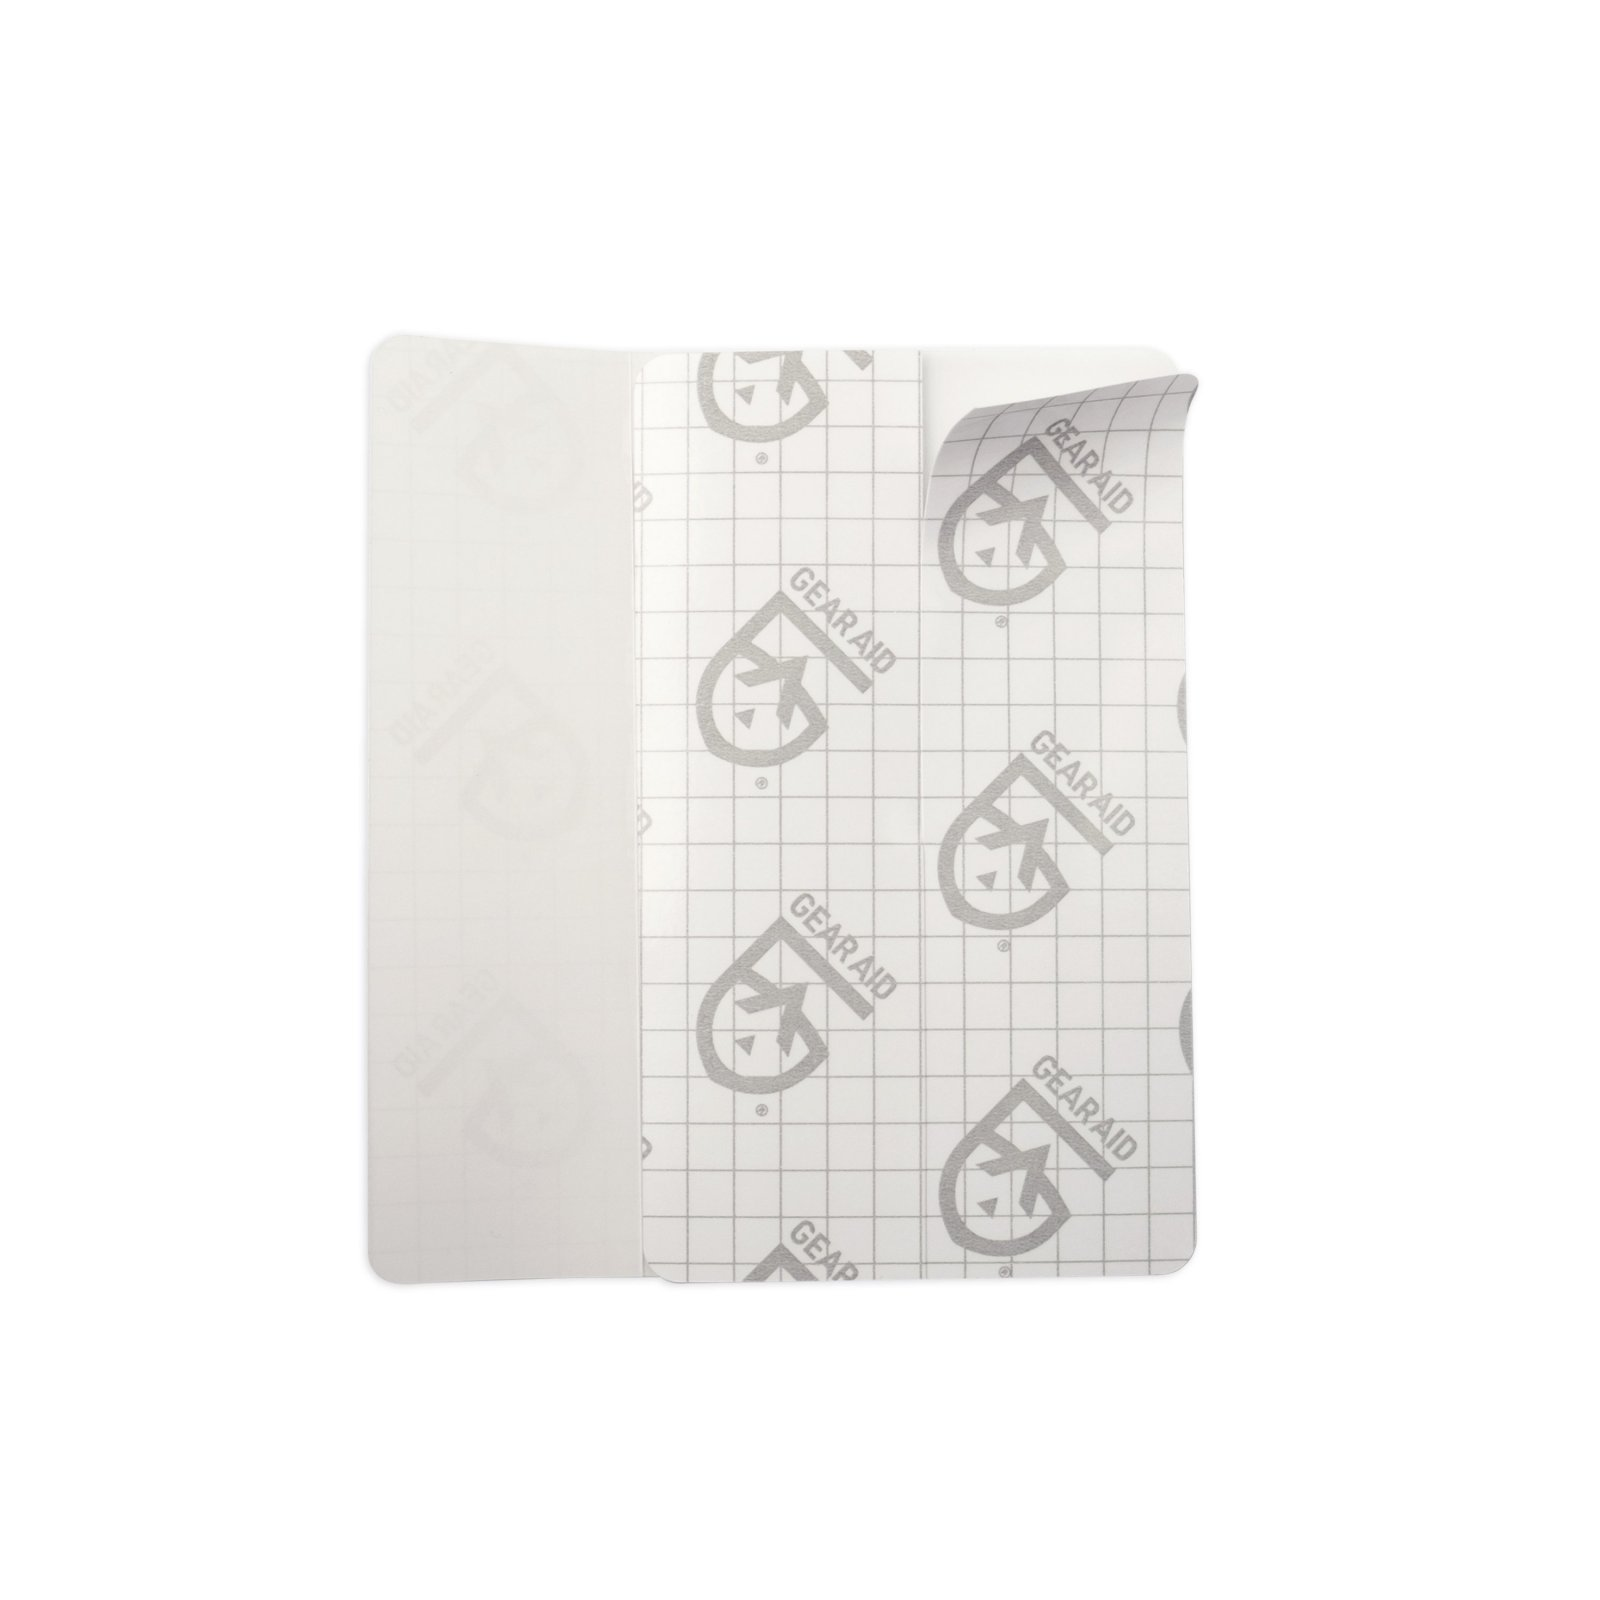 Tenacious Tape  - Clear Flex patches